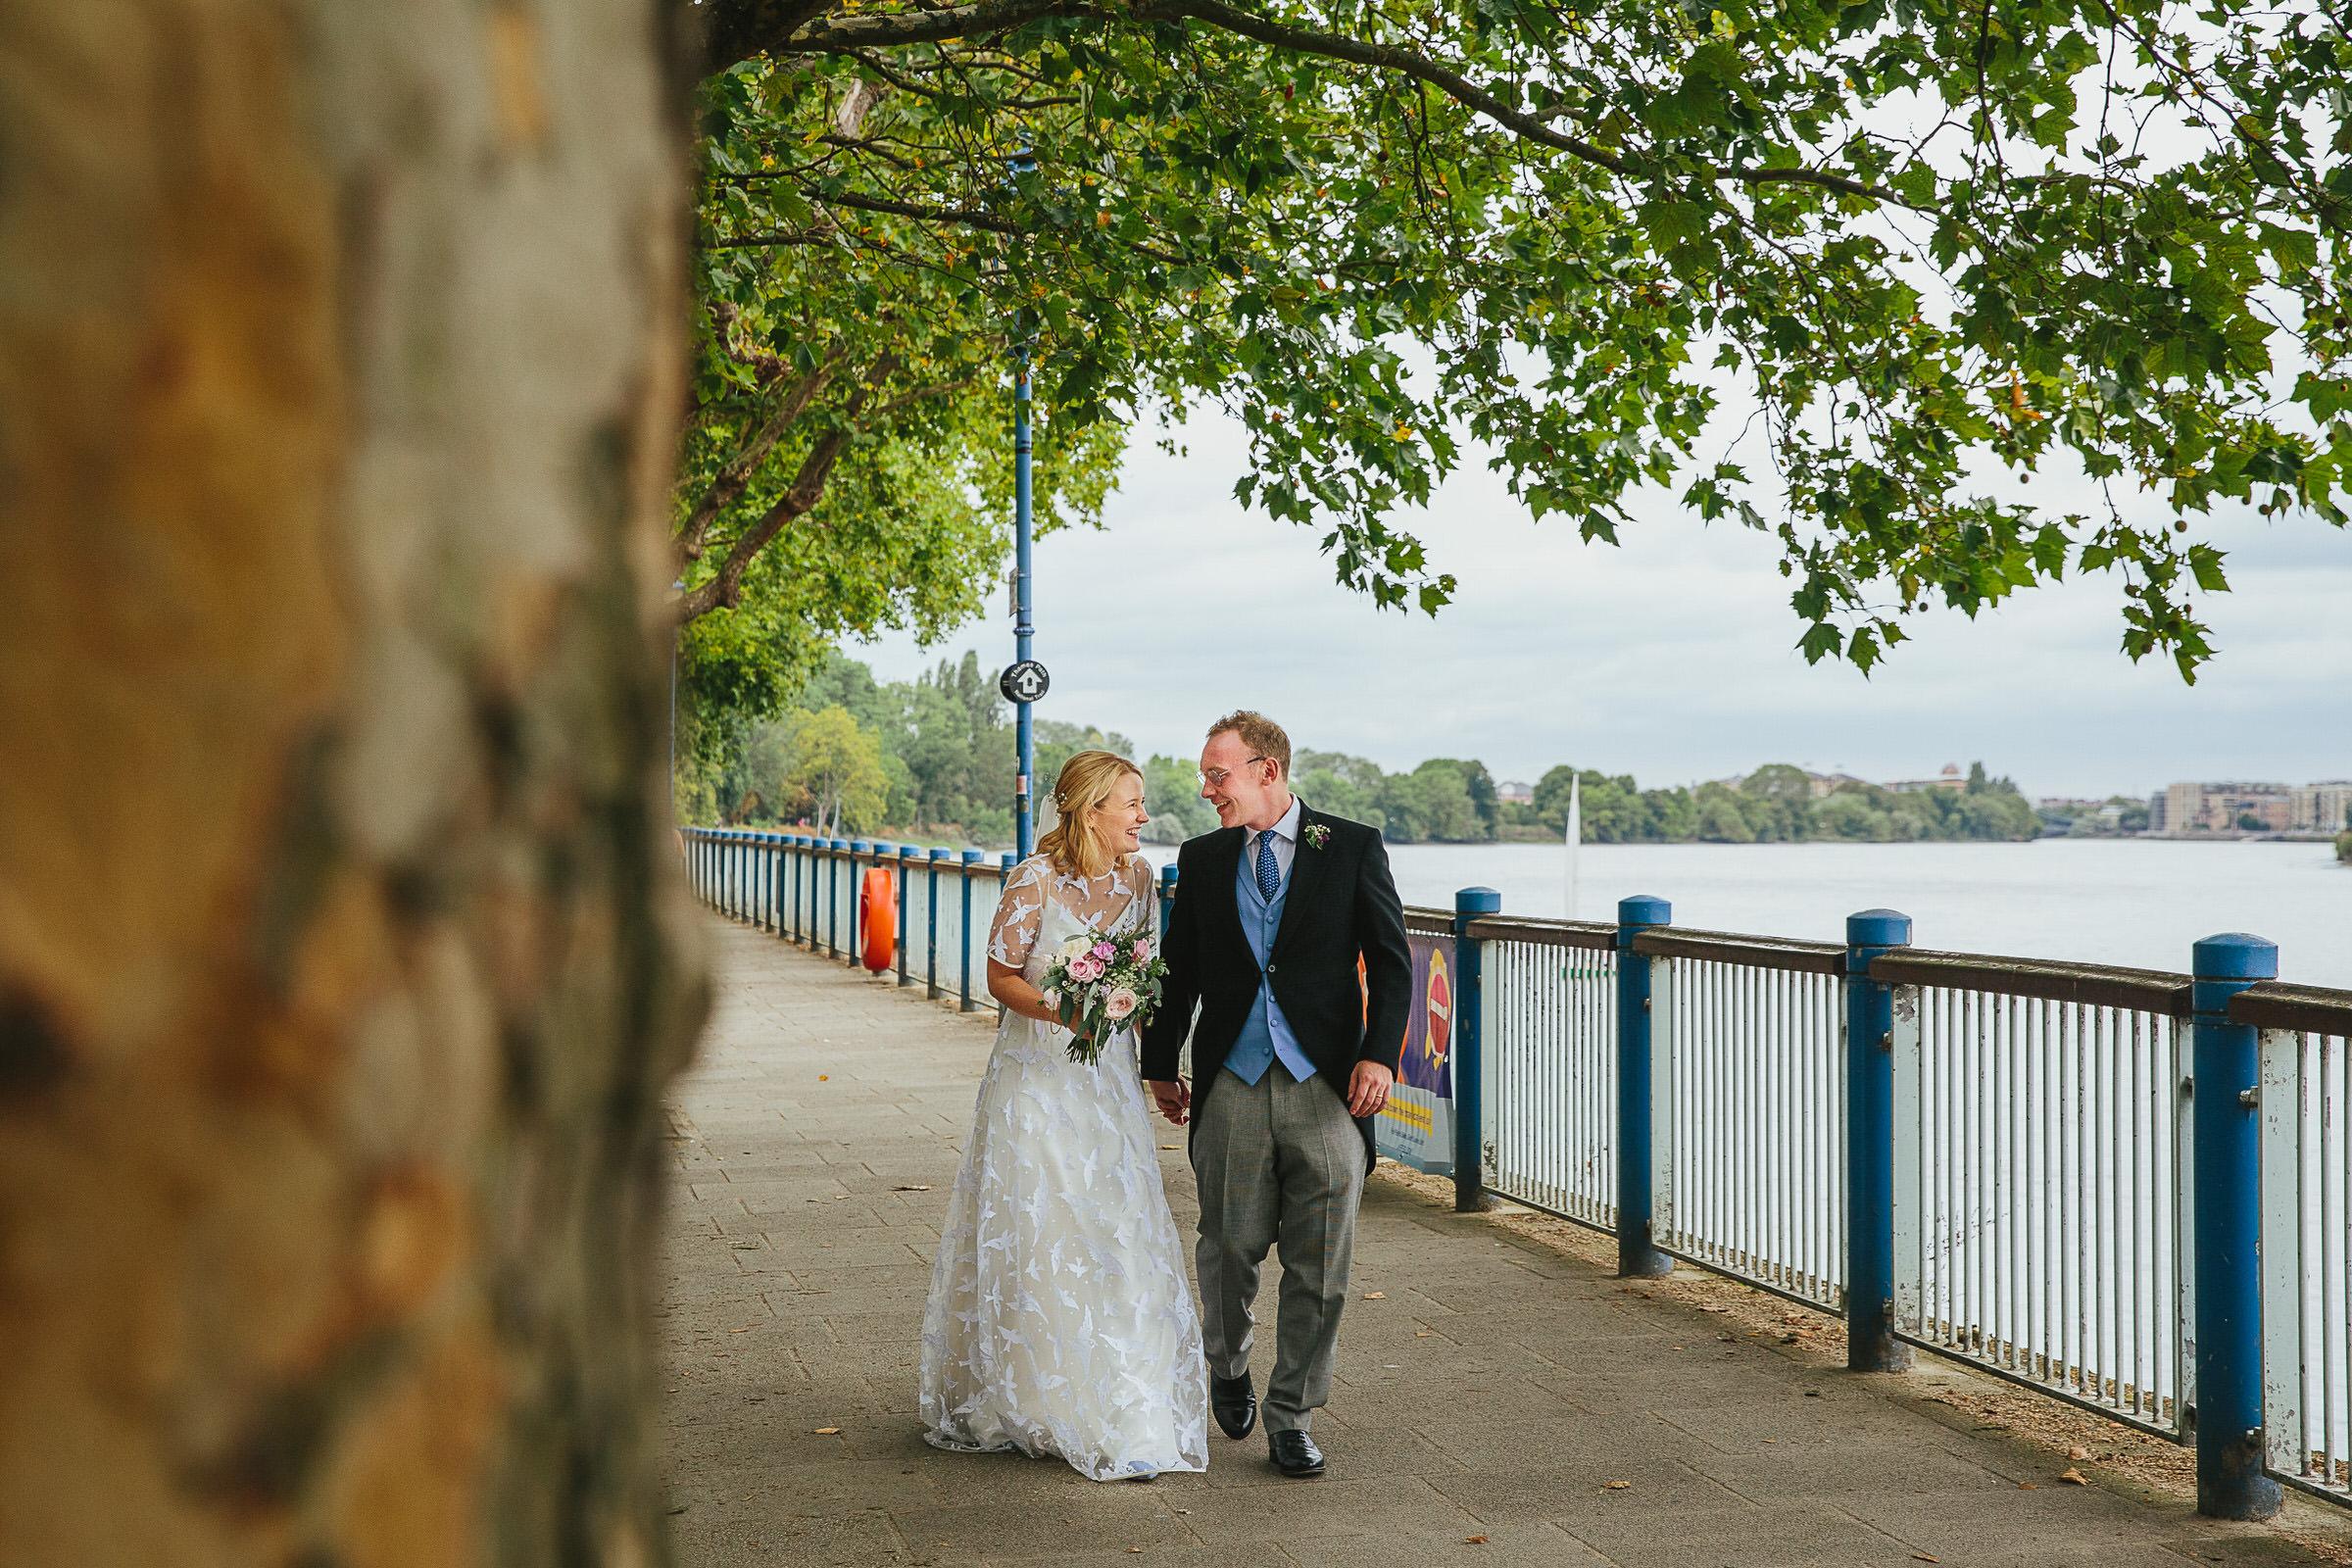 putney embankment wedding